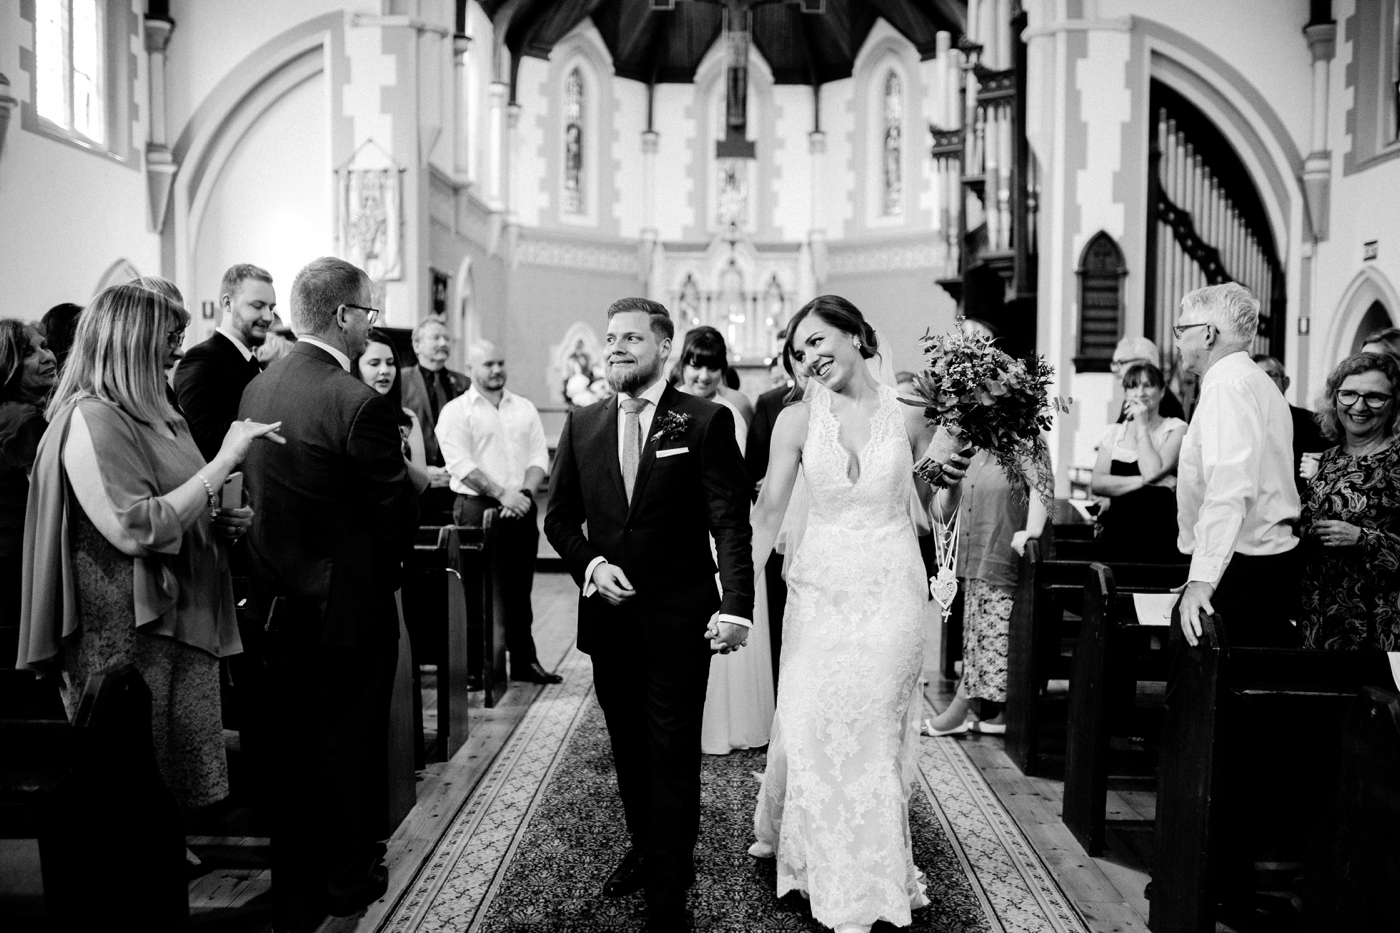 Erin & Ryan - Natural Wedding Photographer in Adelaide - Maximillians Wedding - Simple and Modern Wedding Photographer - Katherine Schultz - www.katherineschultzphotography.com_0028.jpg